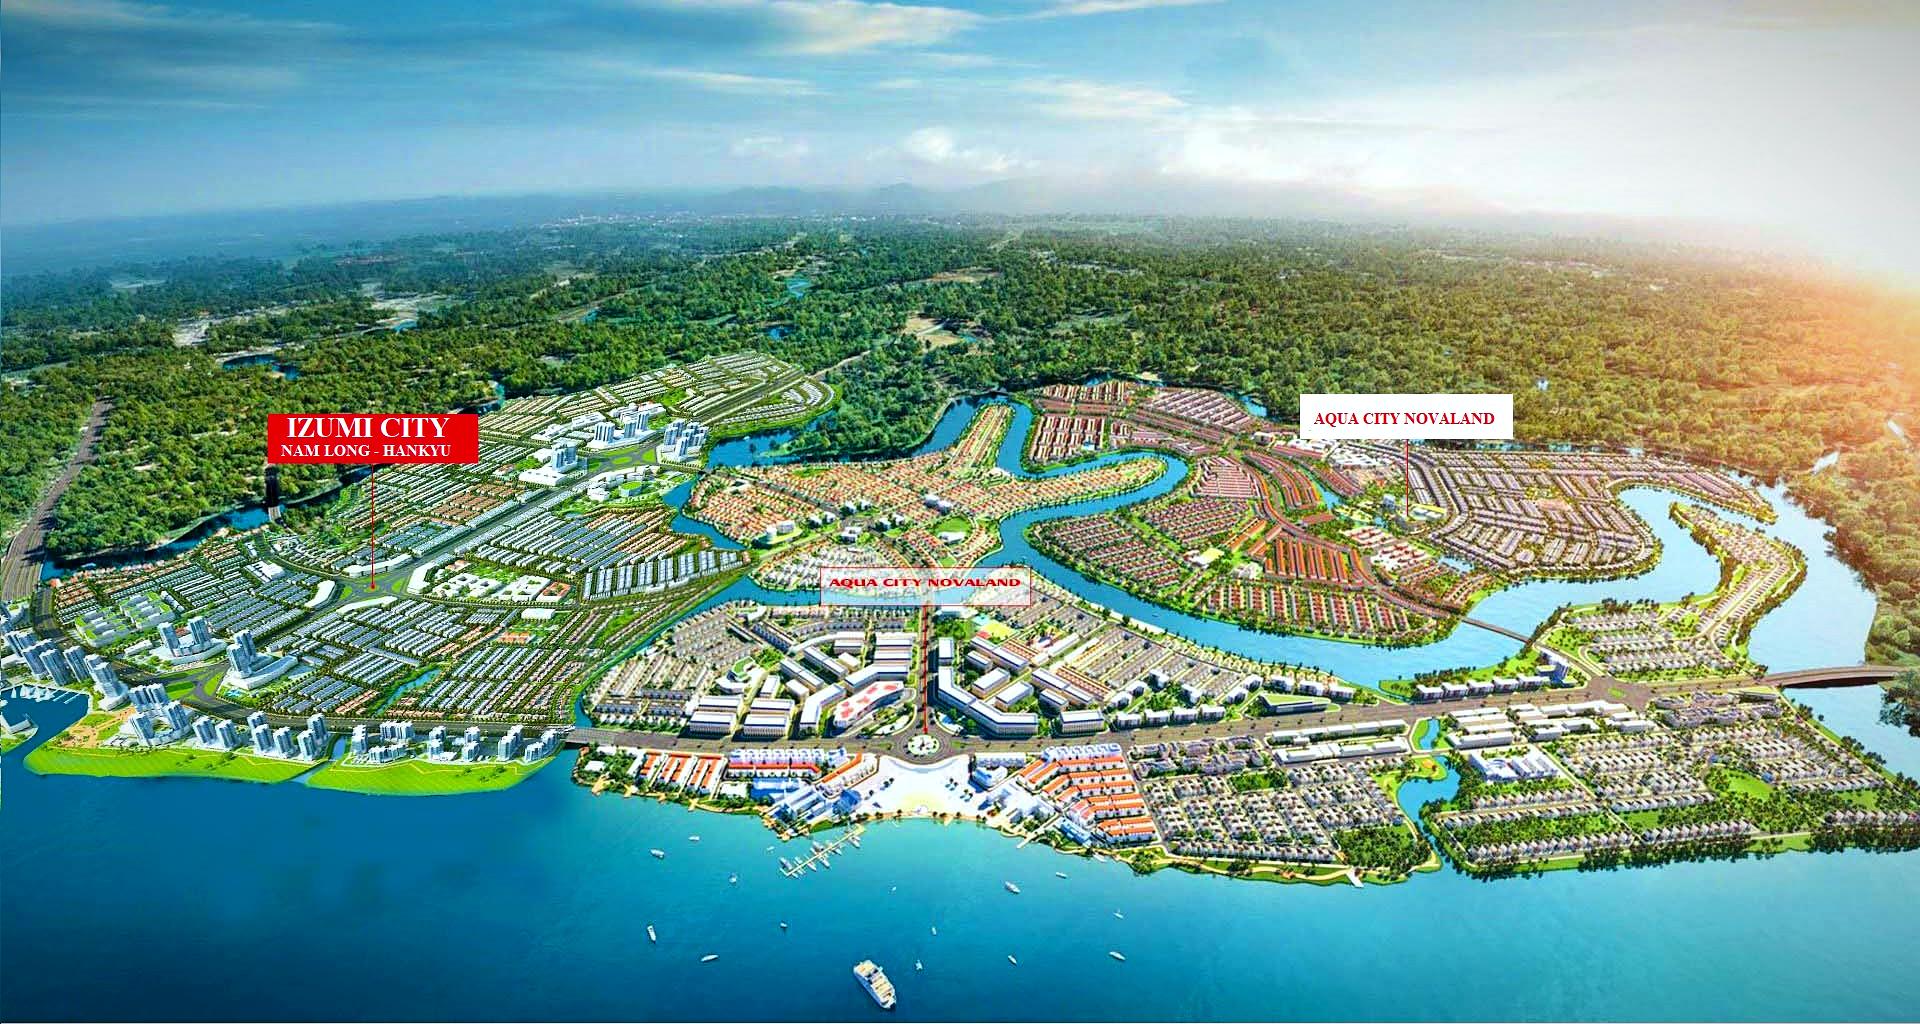 Izumi City Nam Long Hankyu